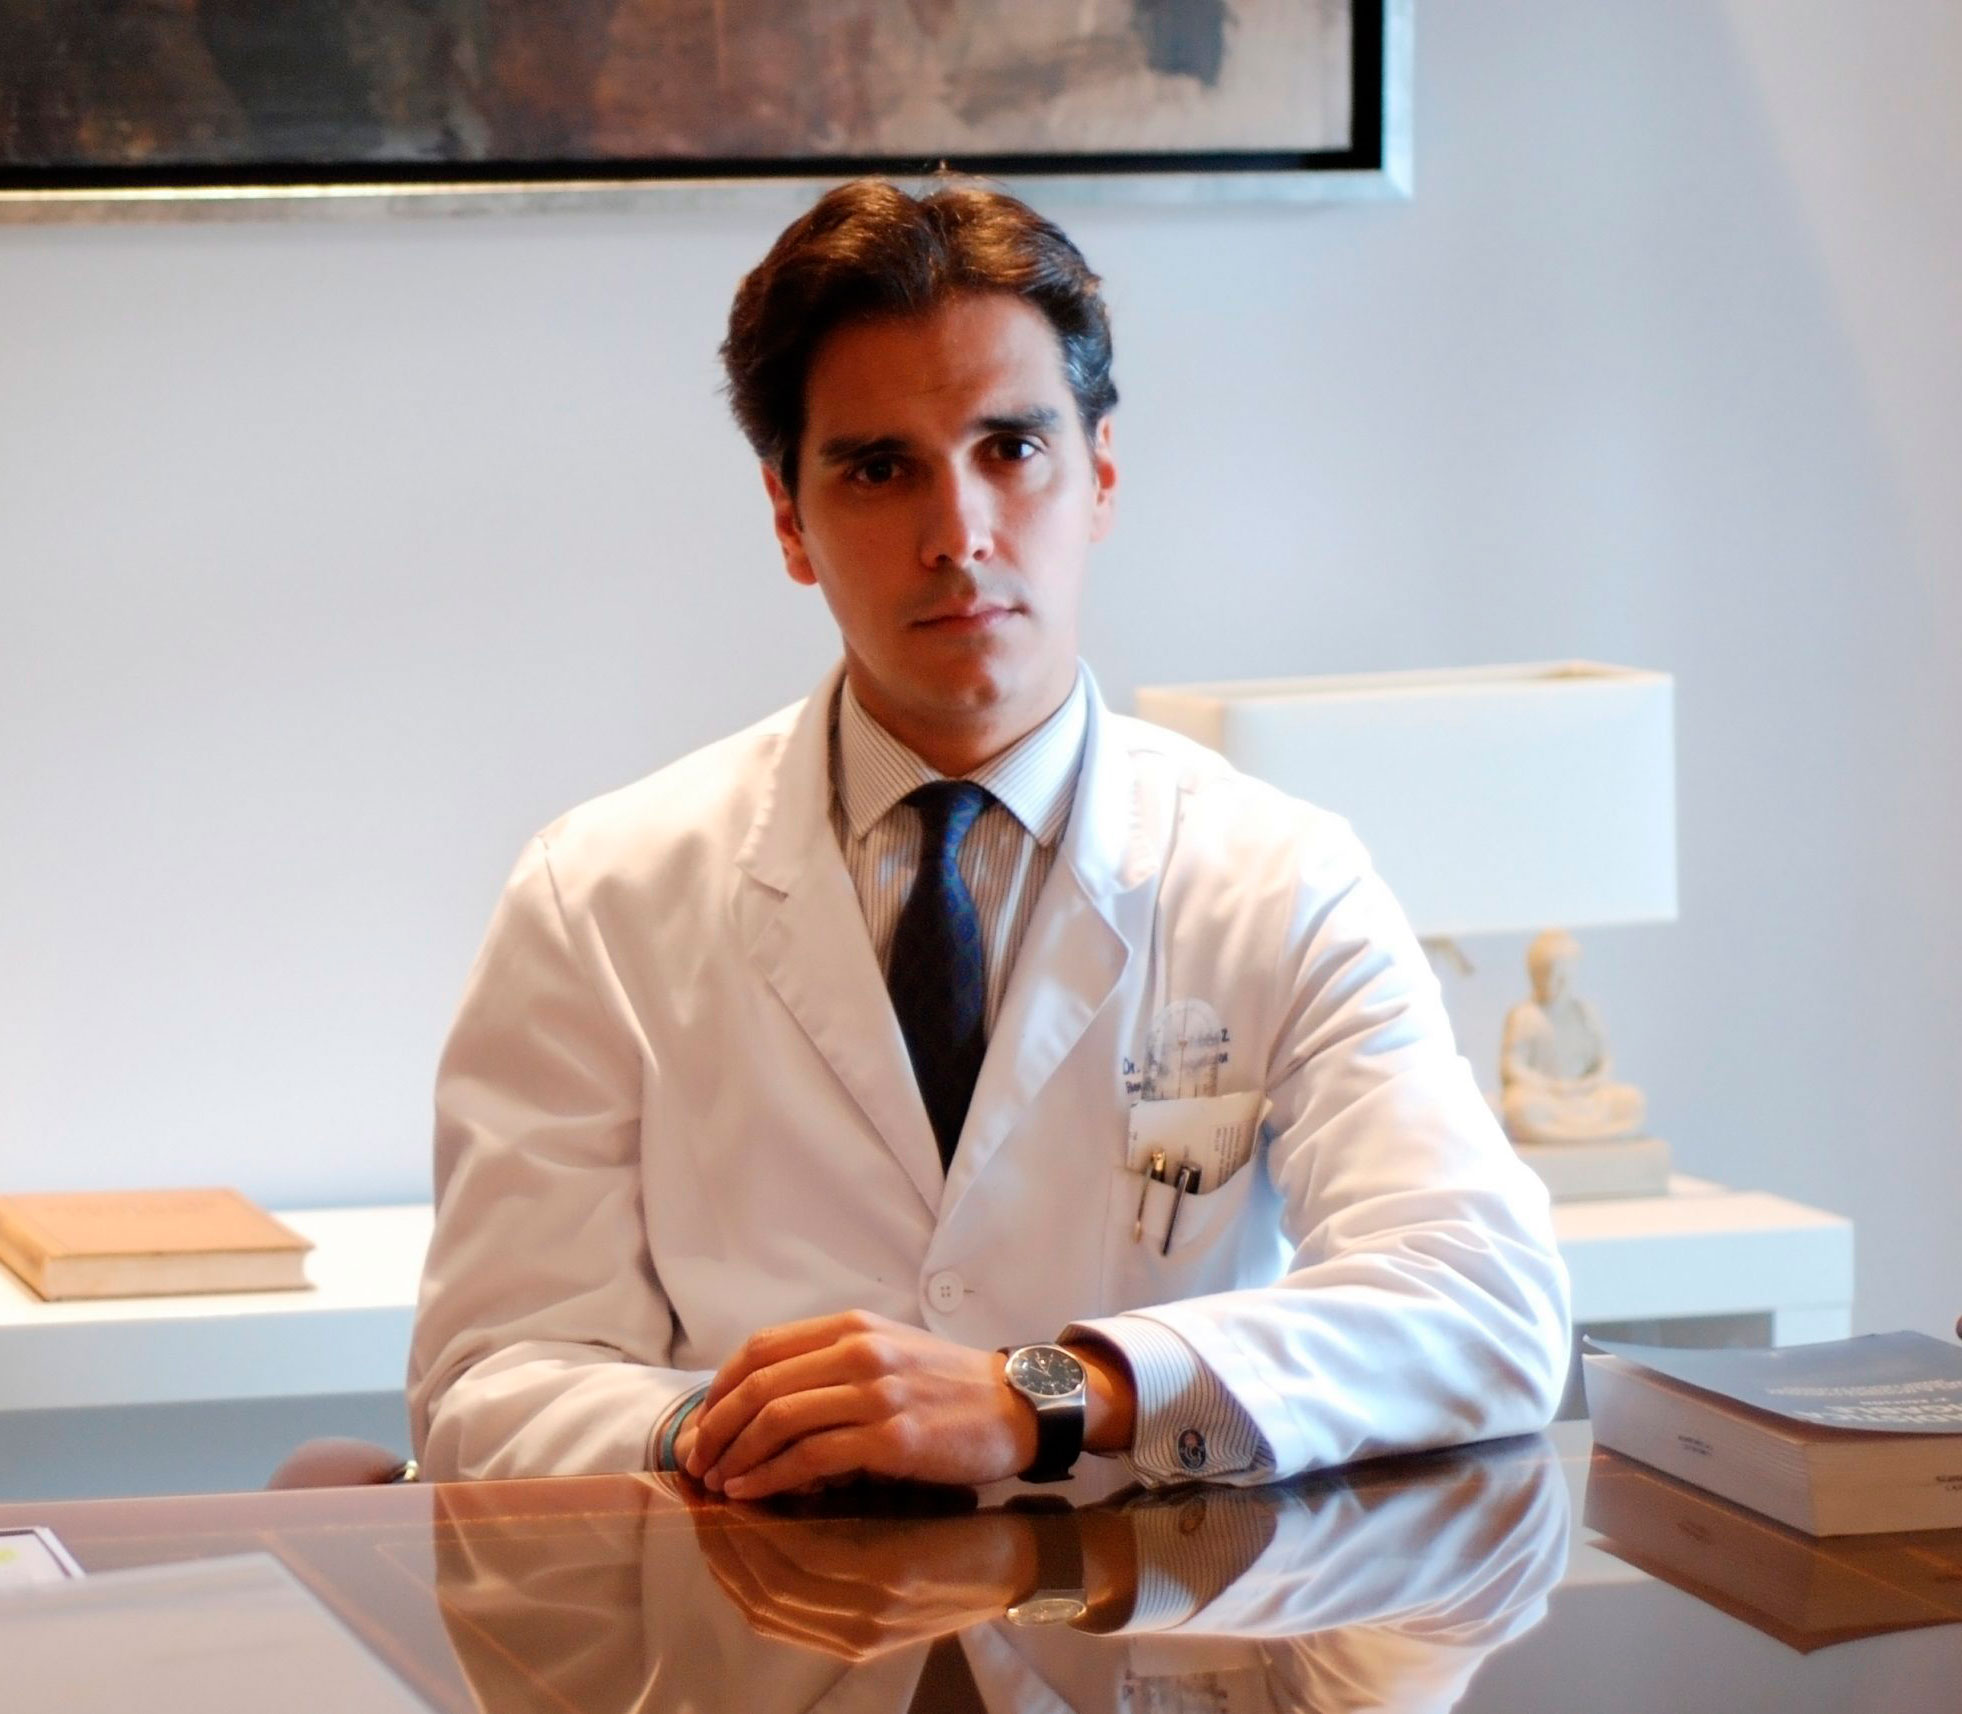 DR. ALEJANDRO MUÑOZ JIMÉNEZ